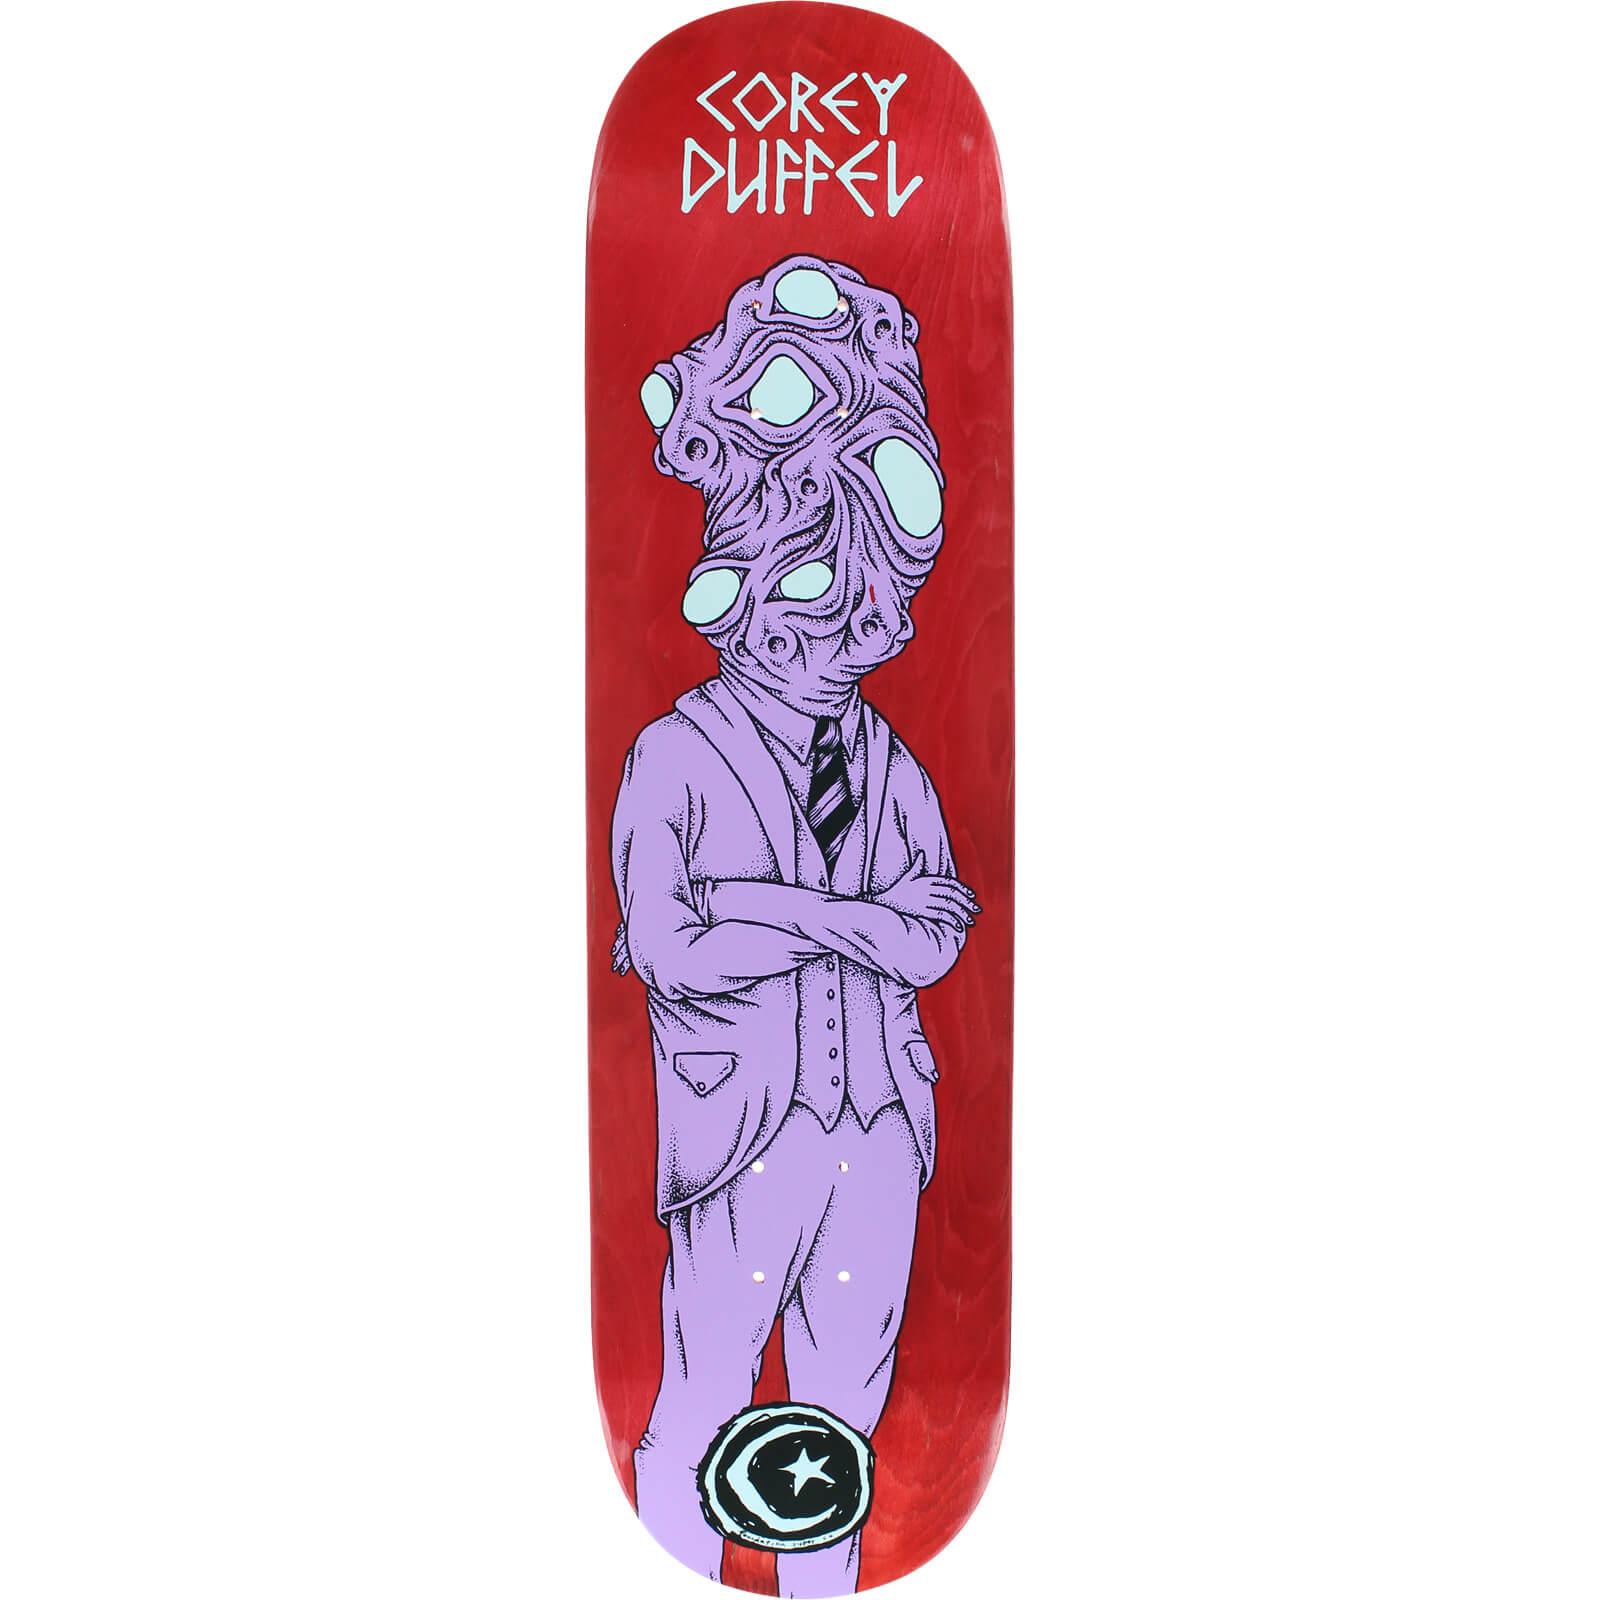 Foundation Skateboards Corey Duffel Man Beast Skateboard